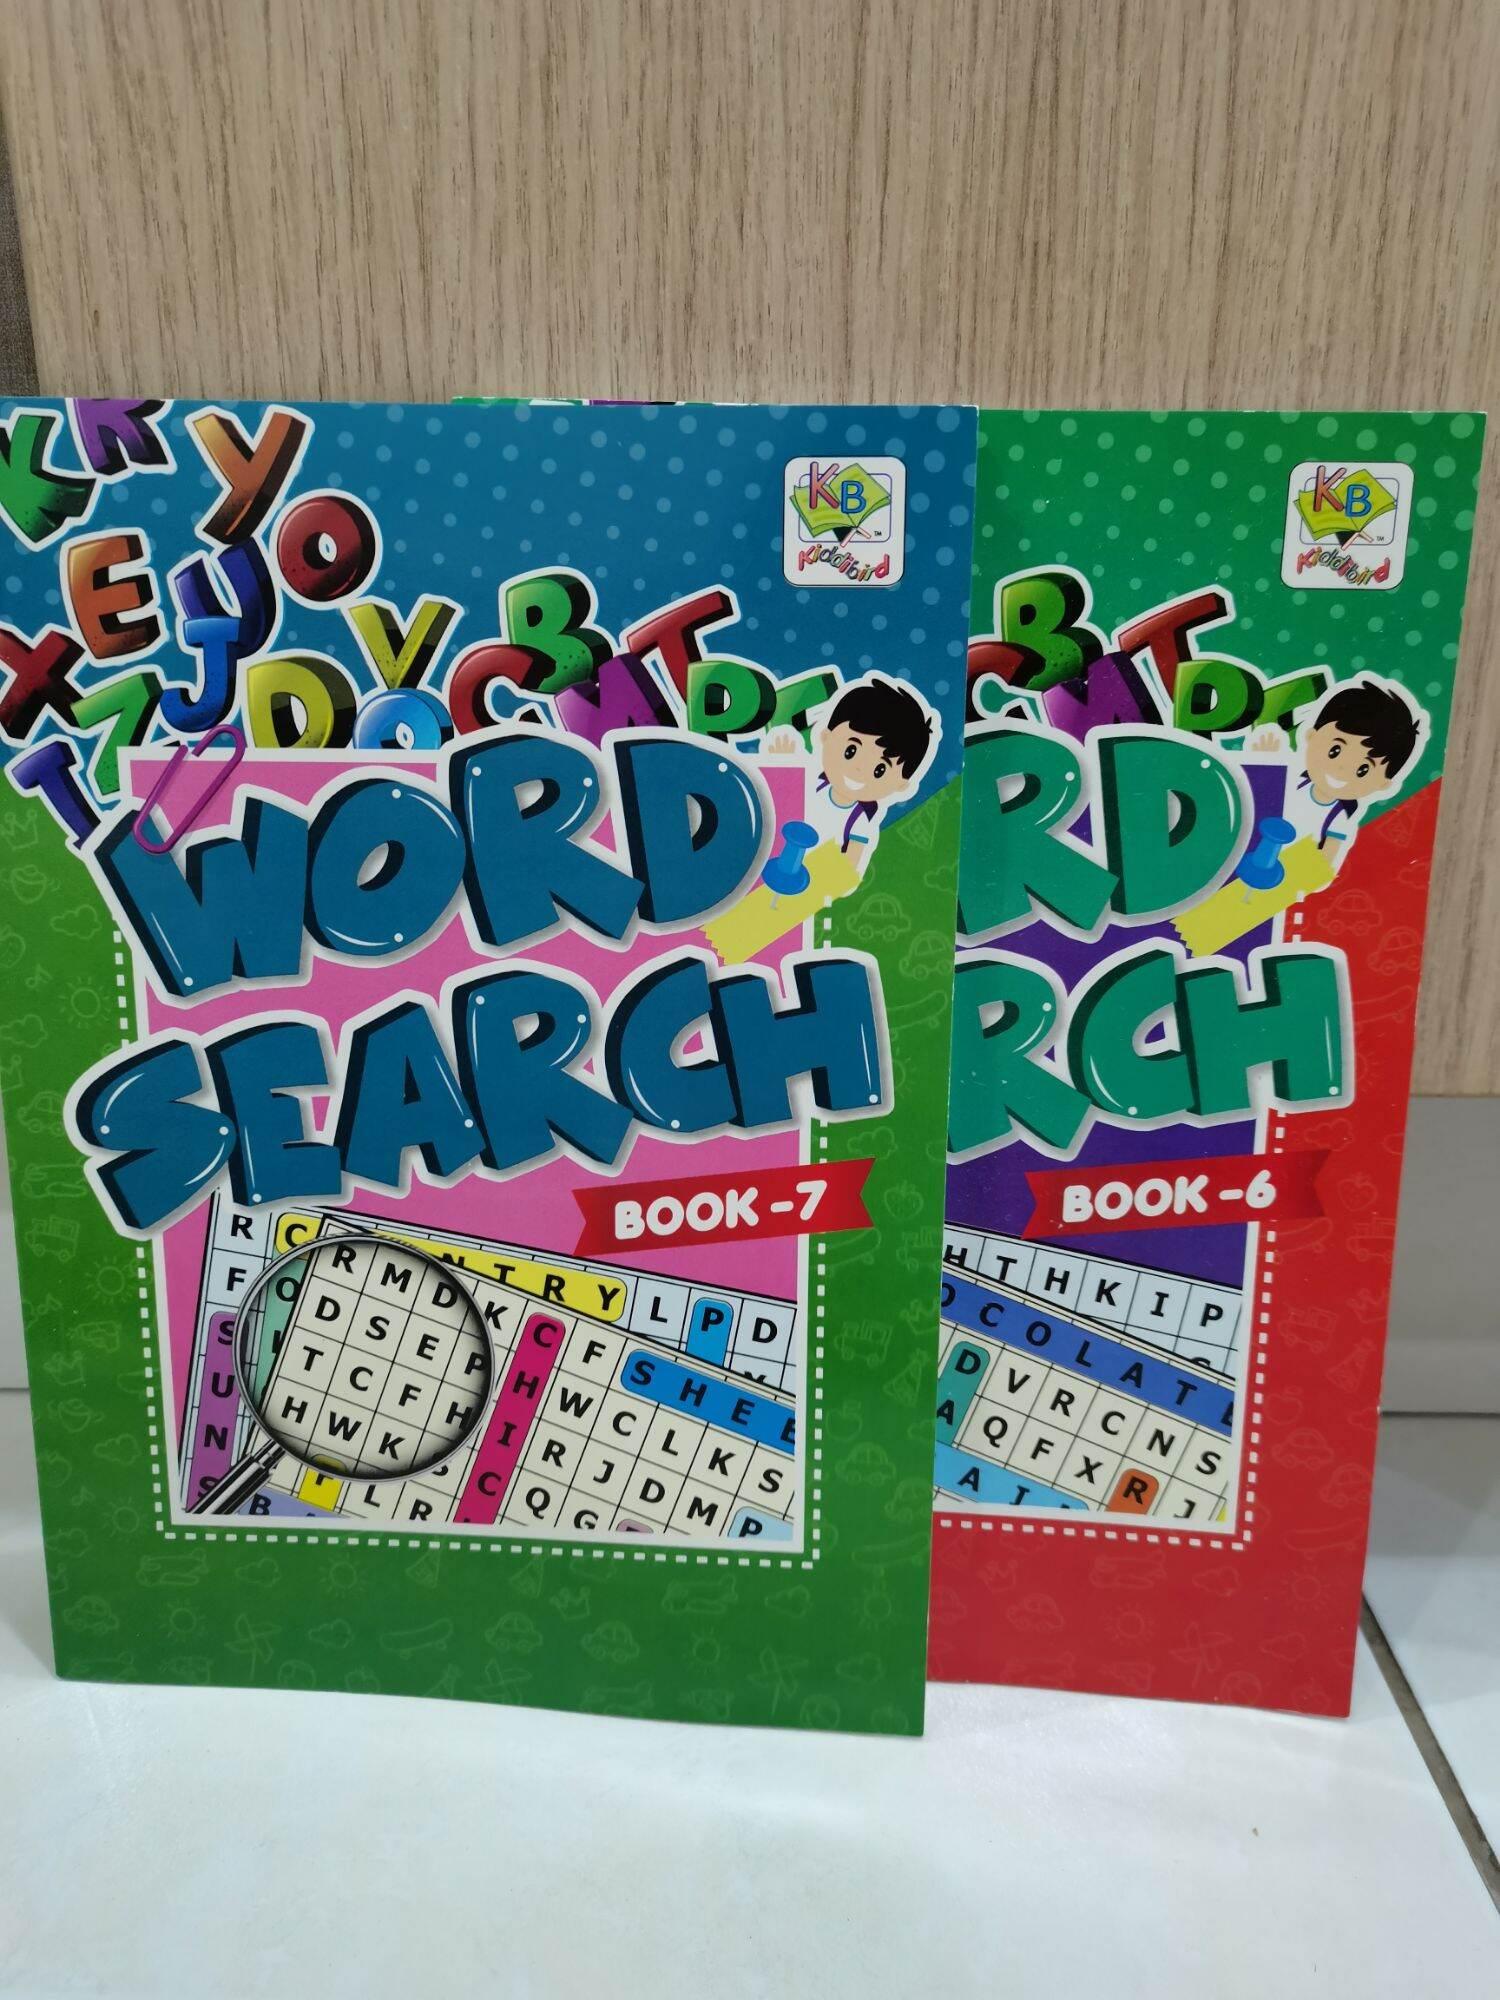 ★ReadyStock★ English Word Search Book Education Puzzle📖 Buku Cari Kata💡 Malaysia